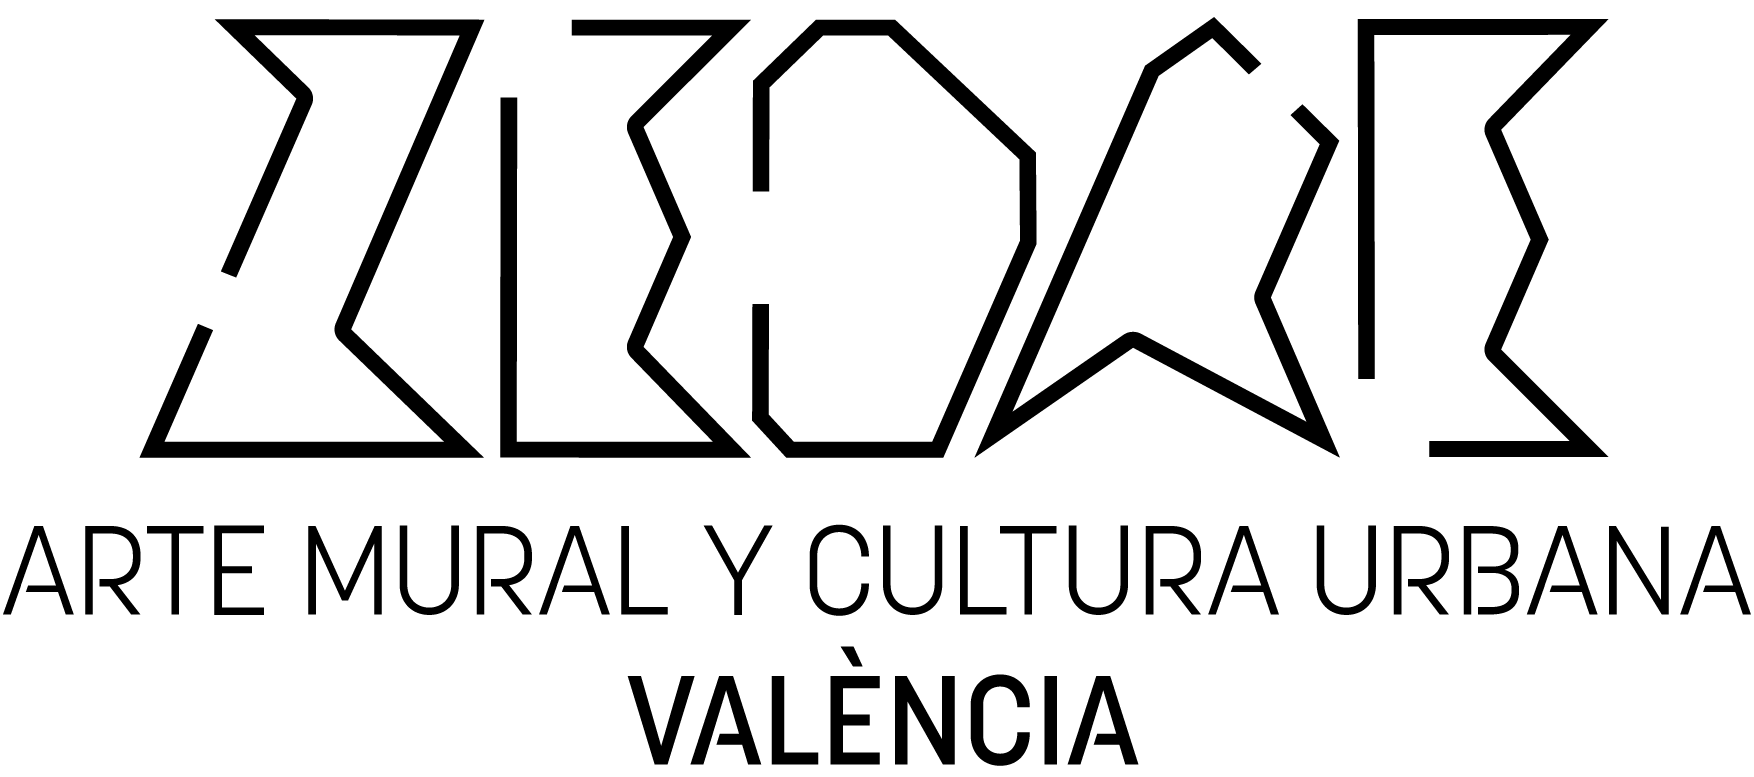 Zedre